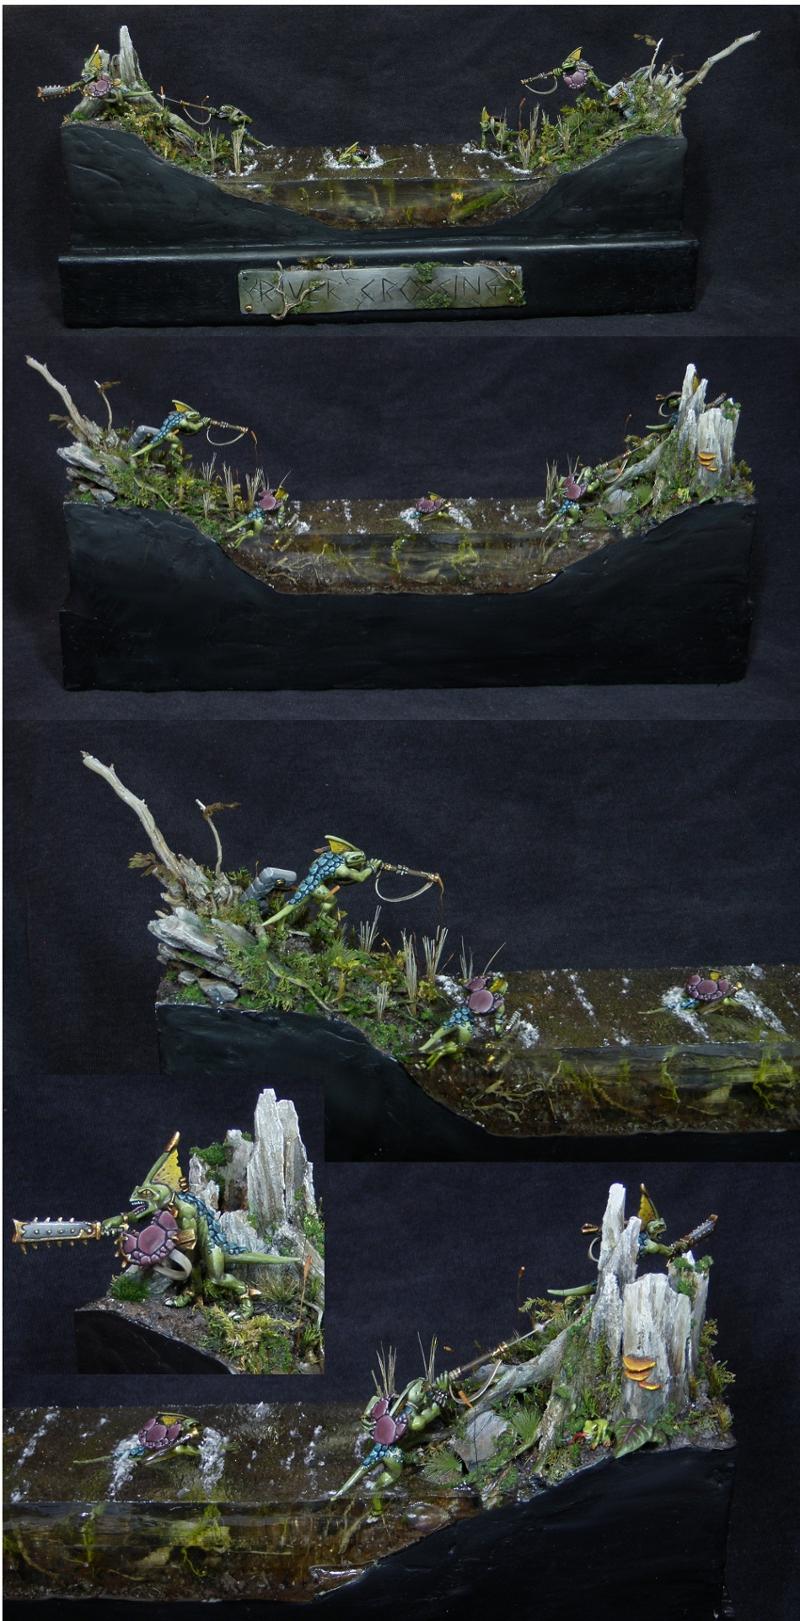 'River Crossing' Skink Diorama AUS GD2011